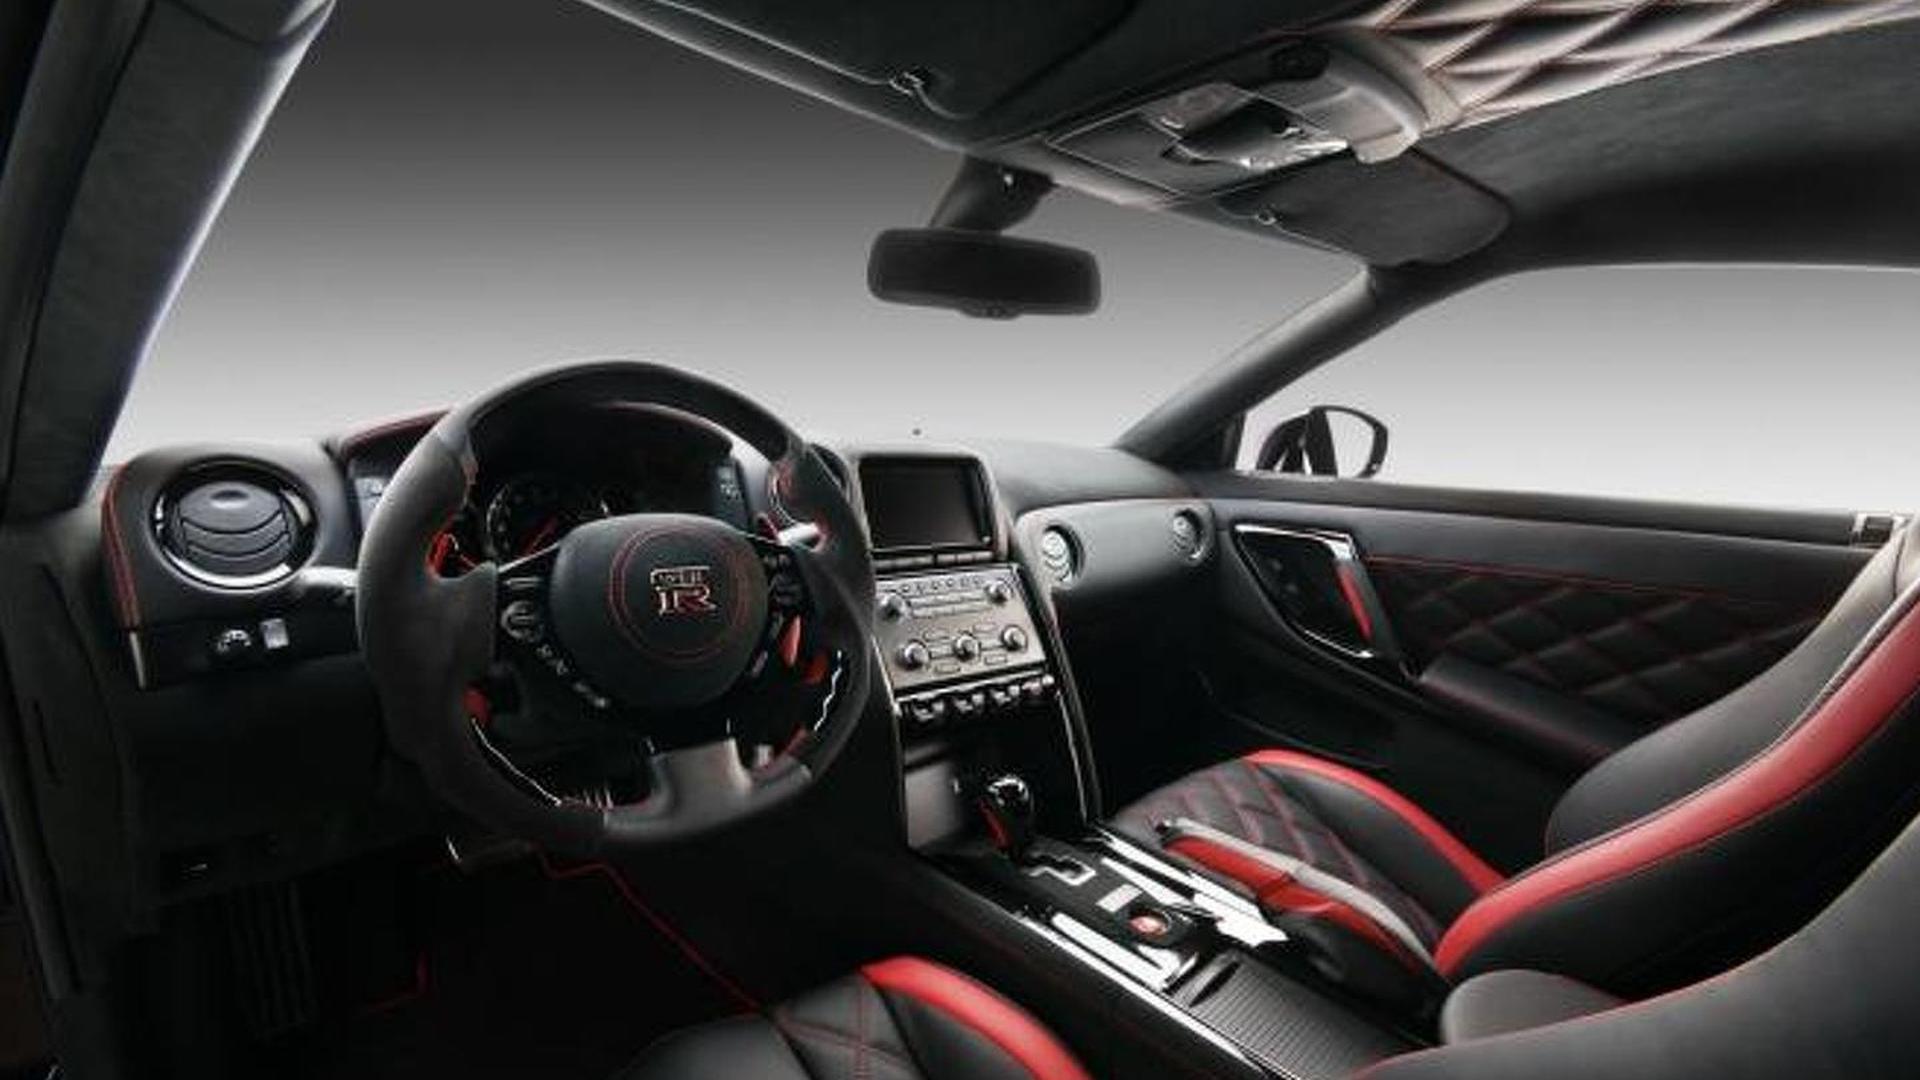 Nissan Gtr Interior >> Vilner Customizes 2012 Nissan Gt R Interior